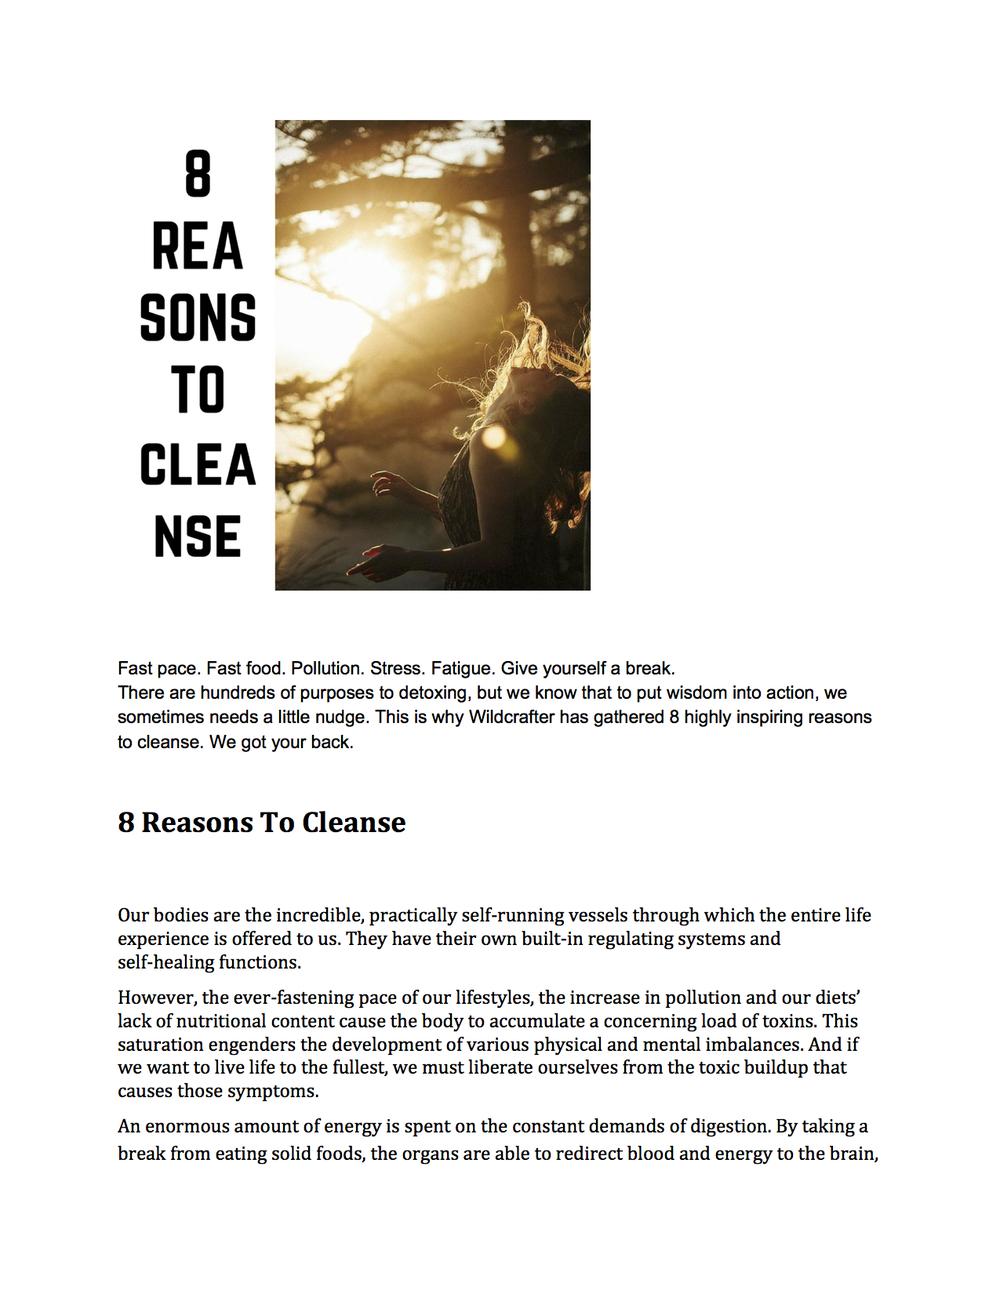 Cleanse1.jpg